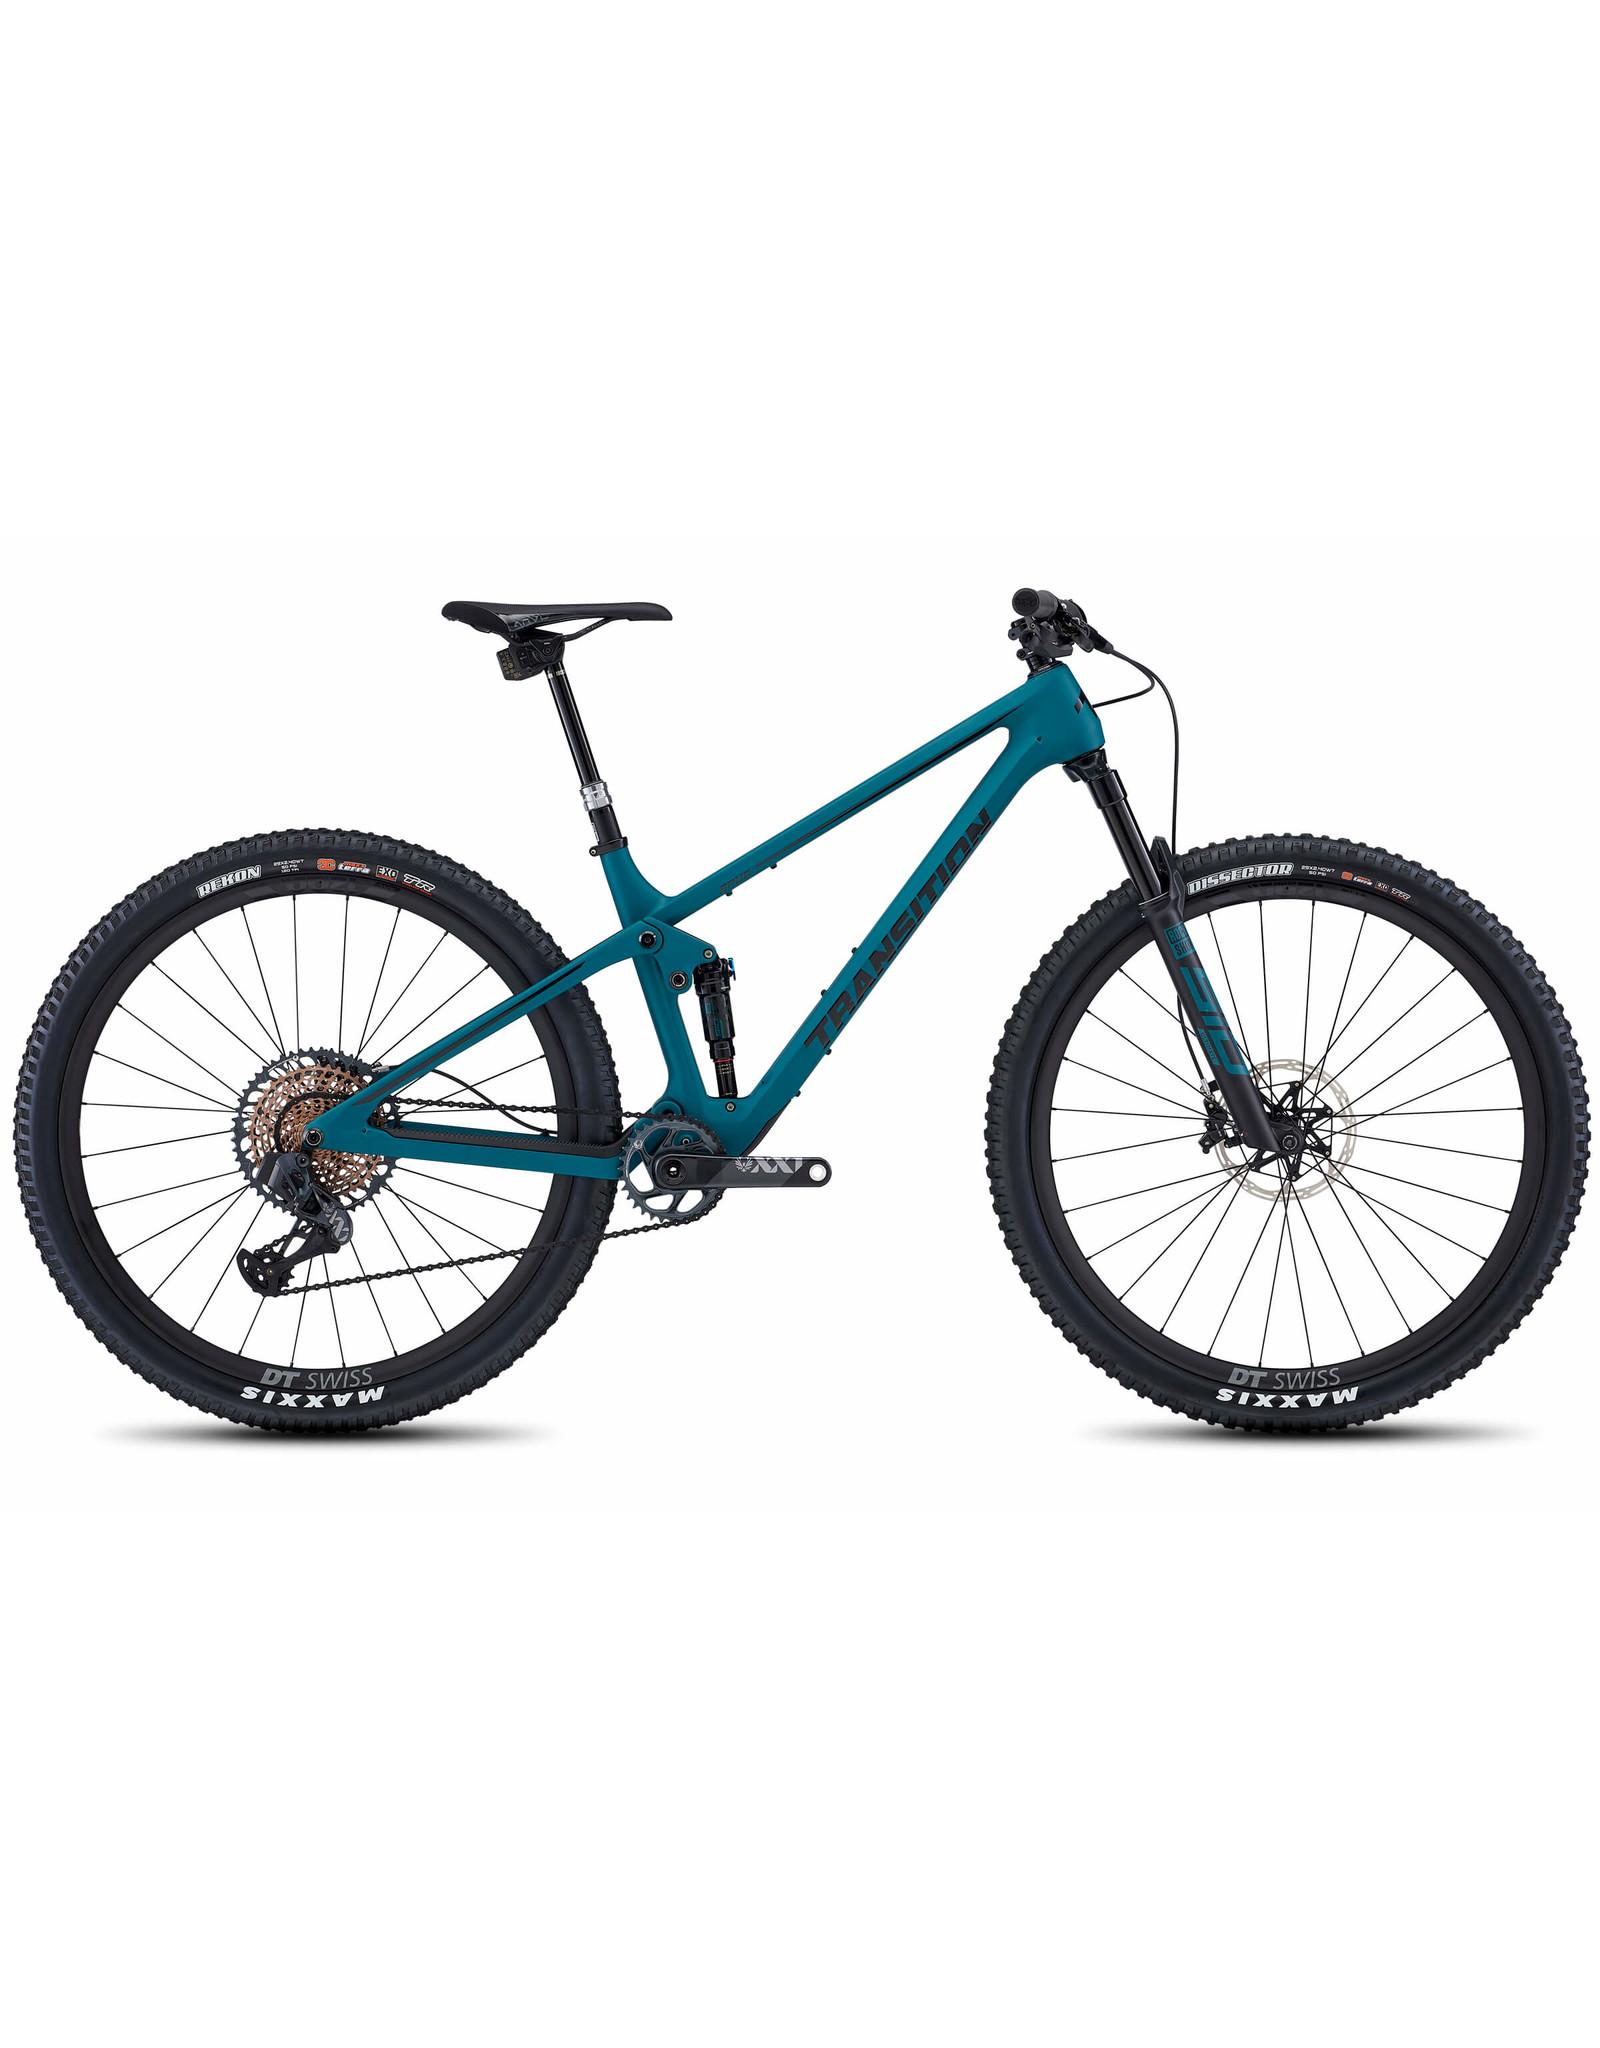 Transition Bikes Transition Spur XX1